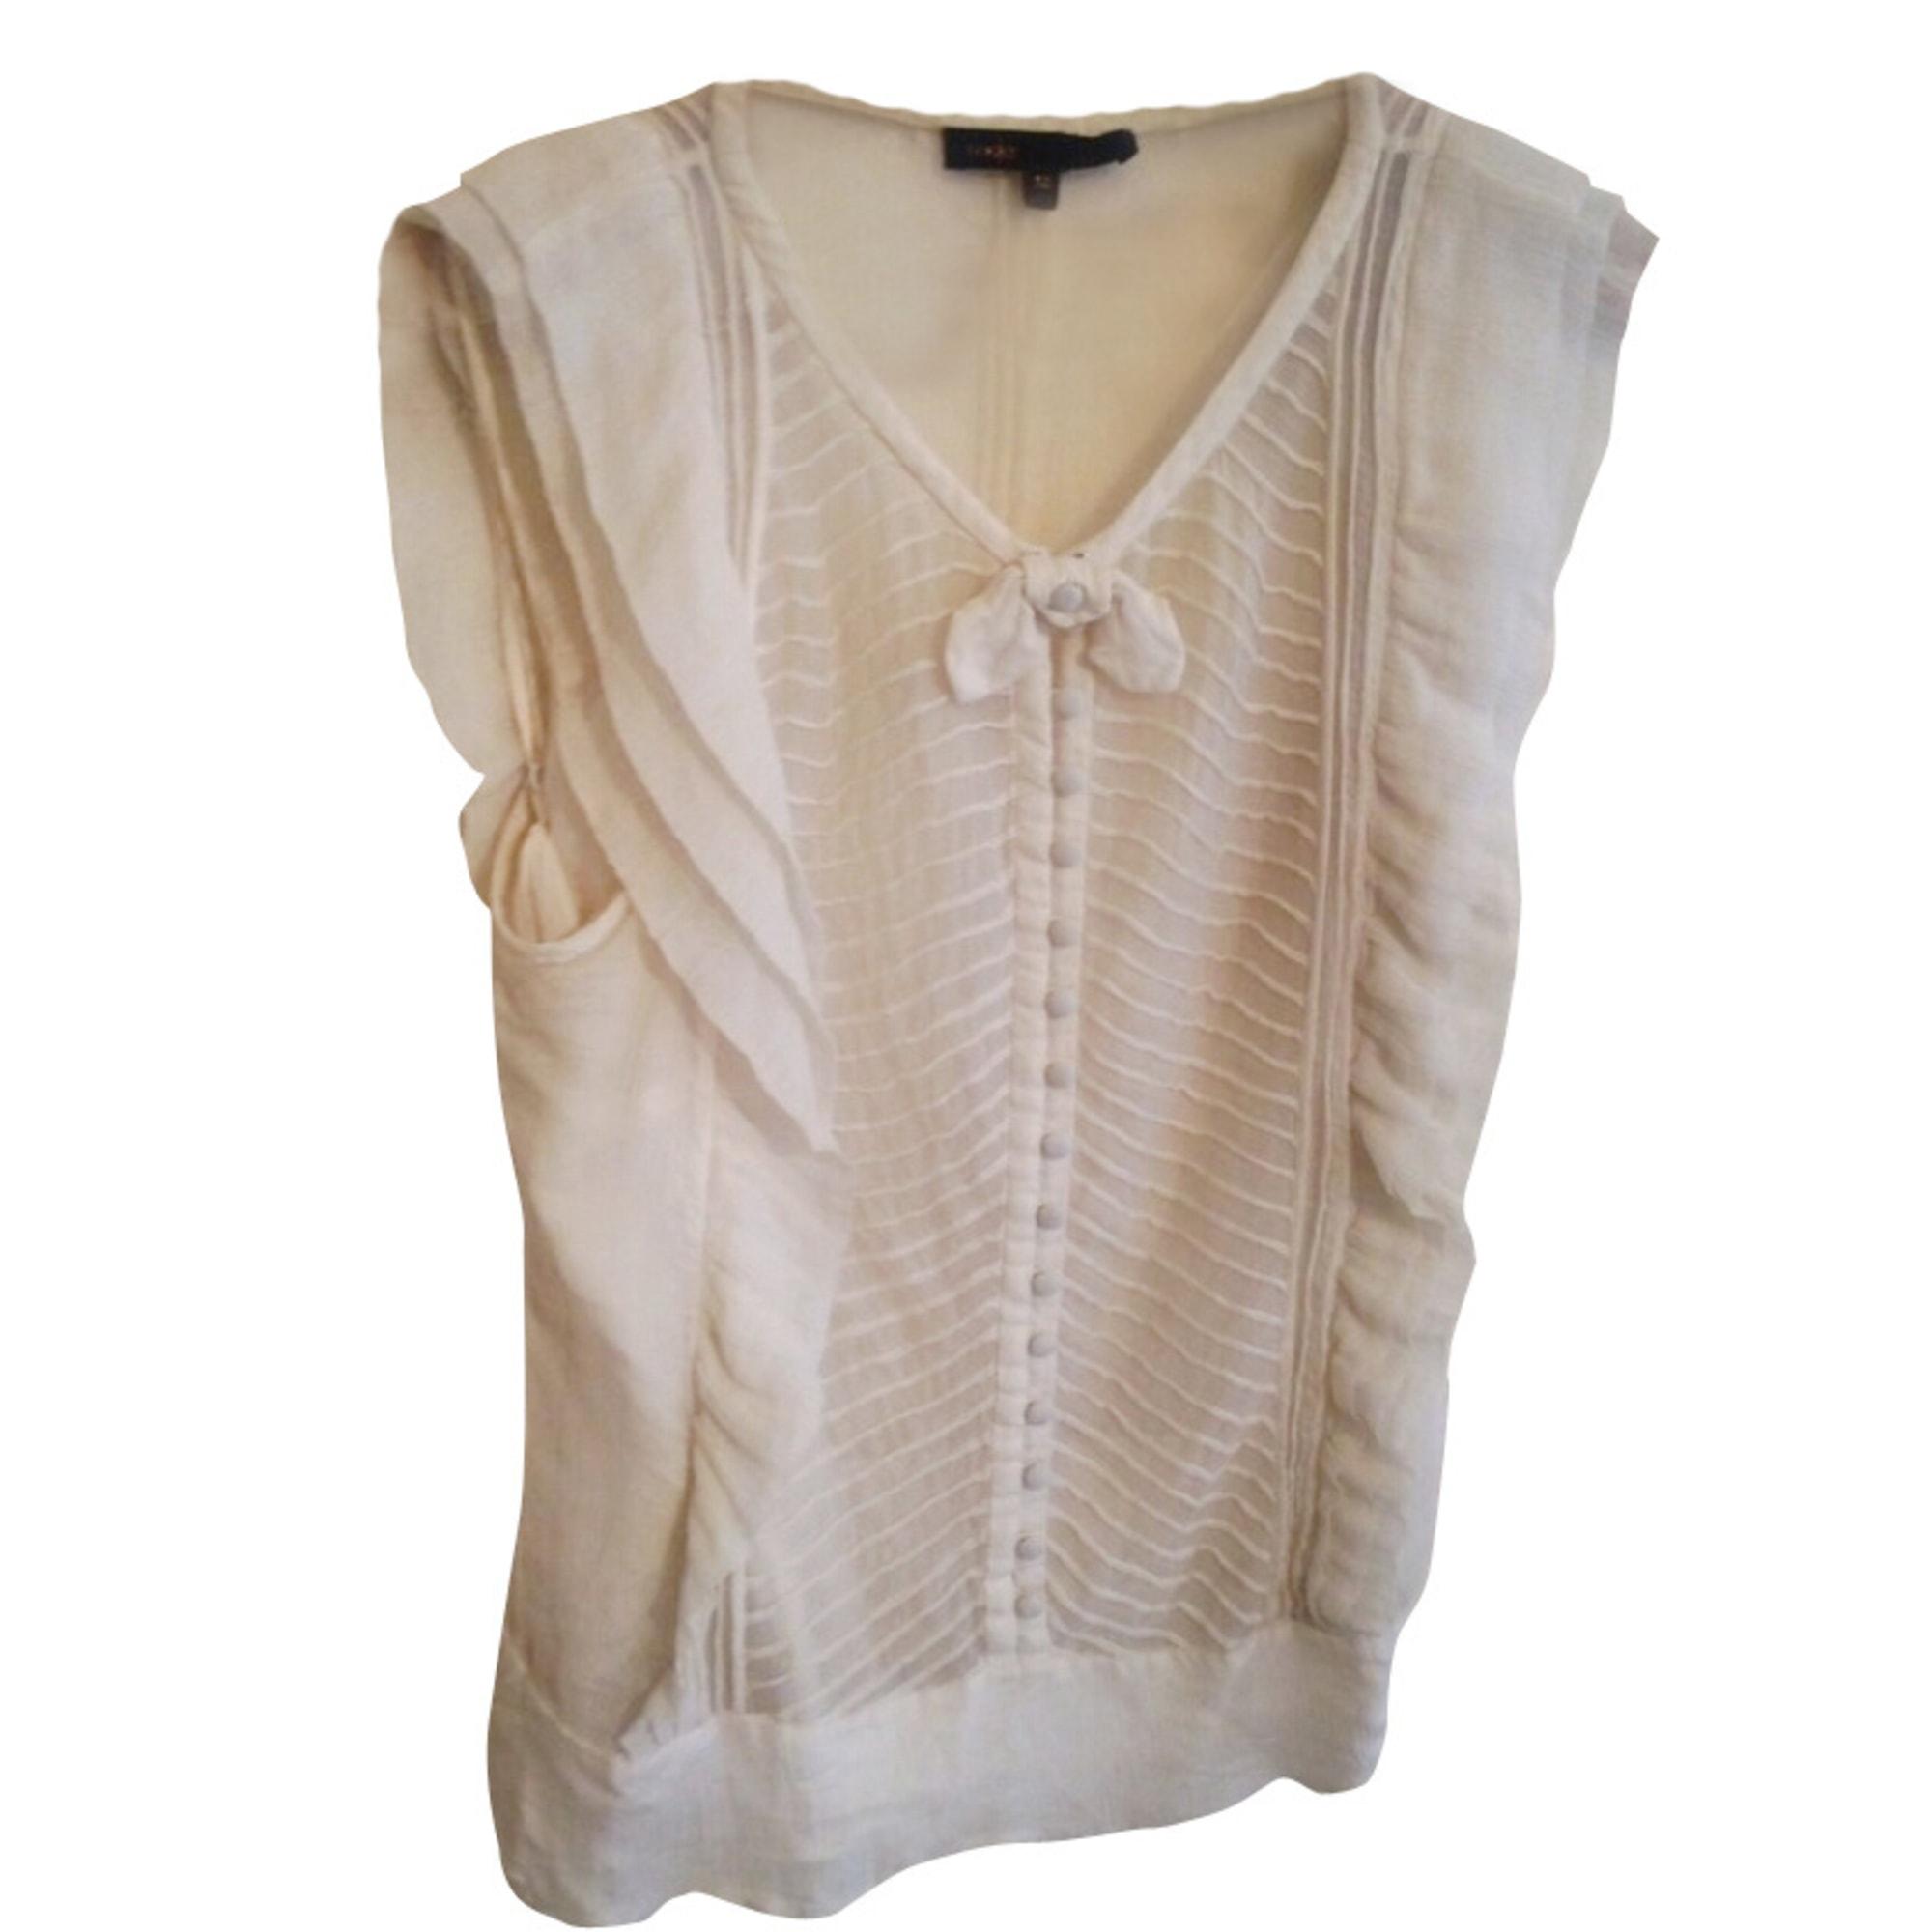 Top, T-shirt MAJE White, off-white, ecru